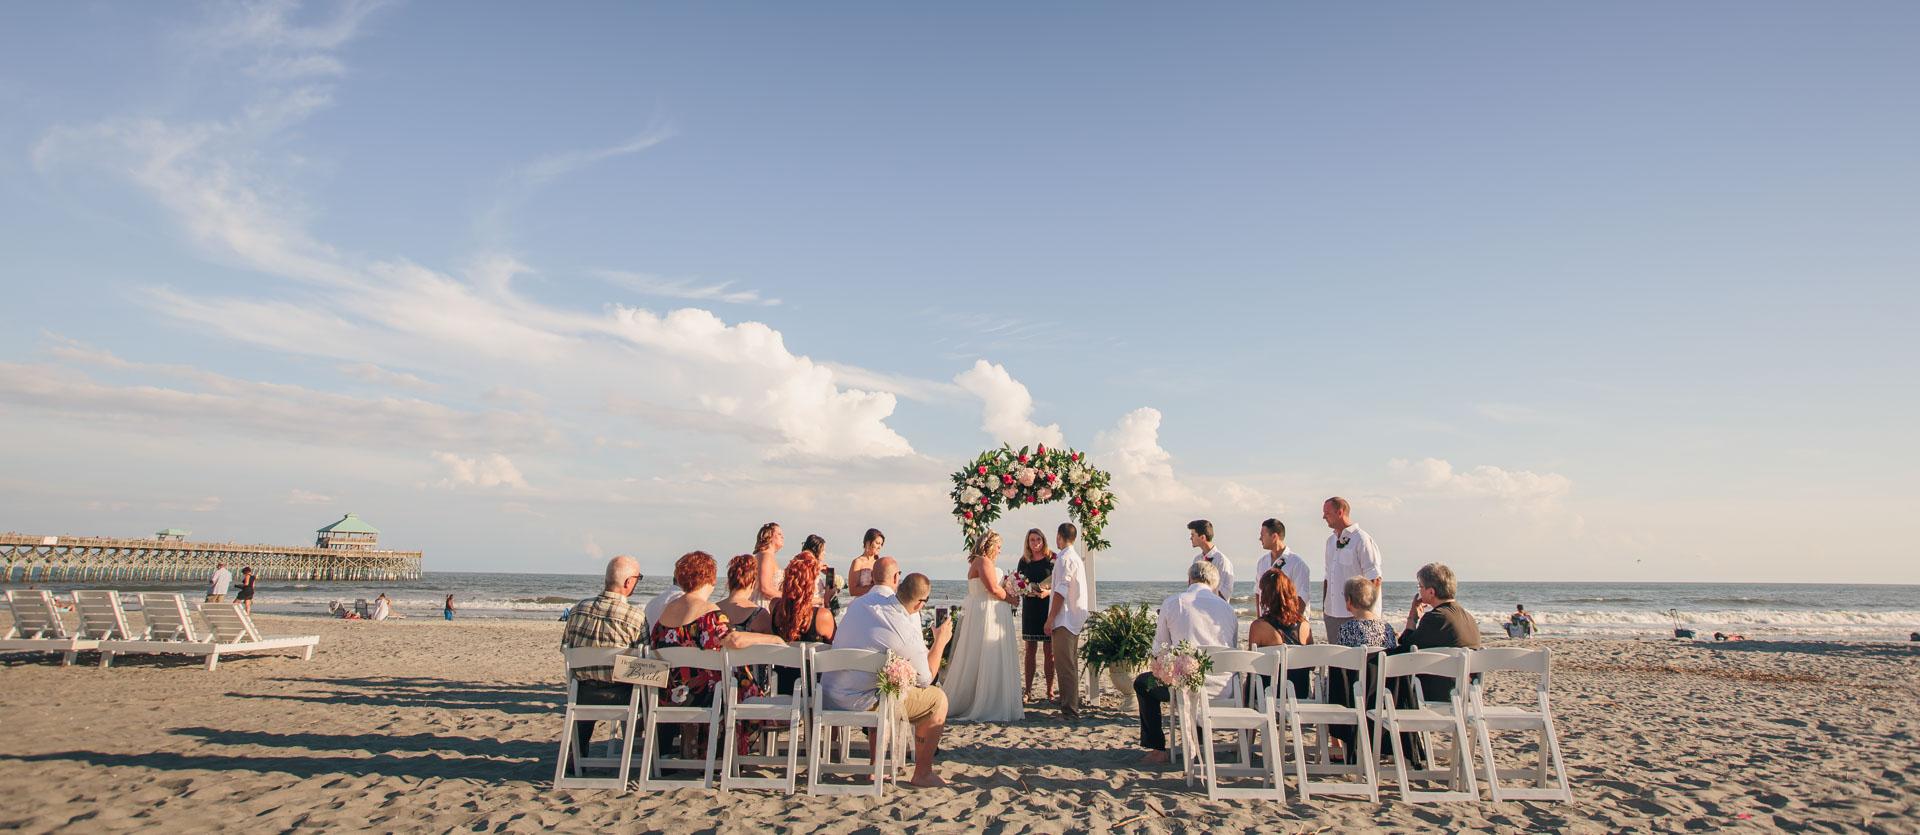 kiraly-ceremony